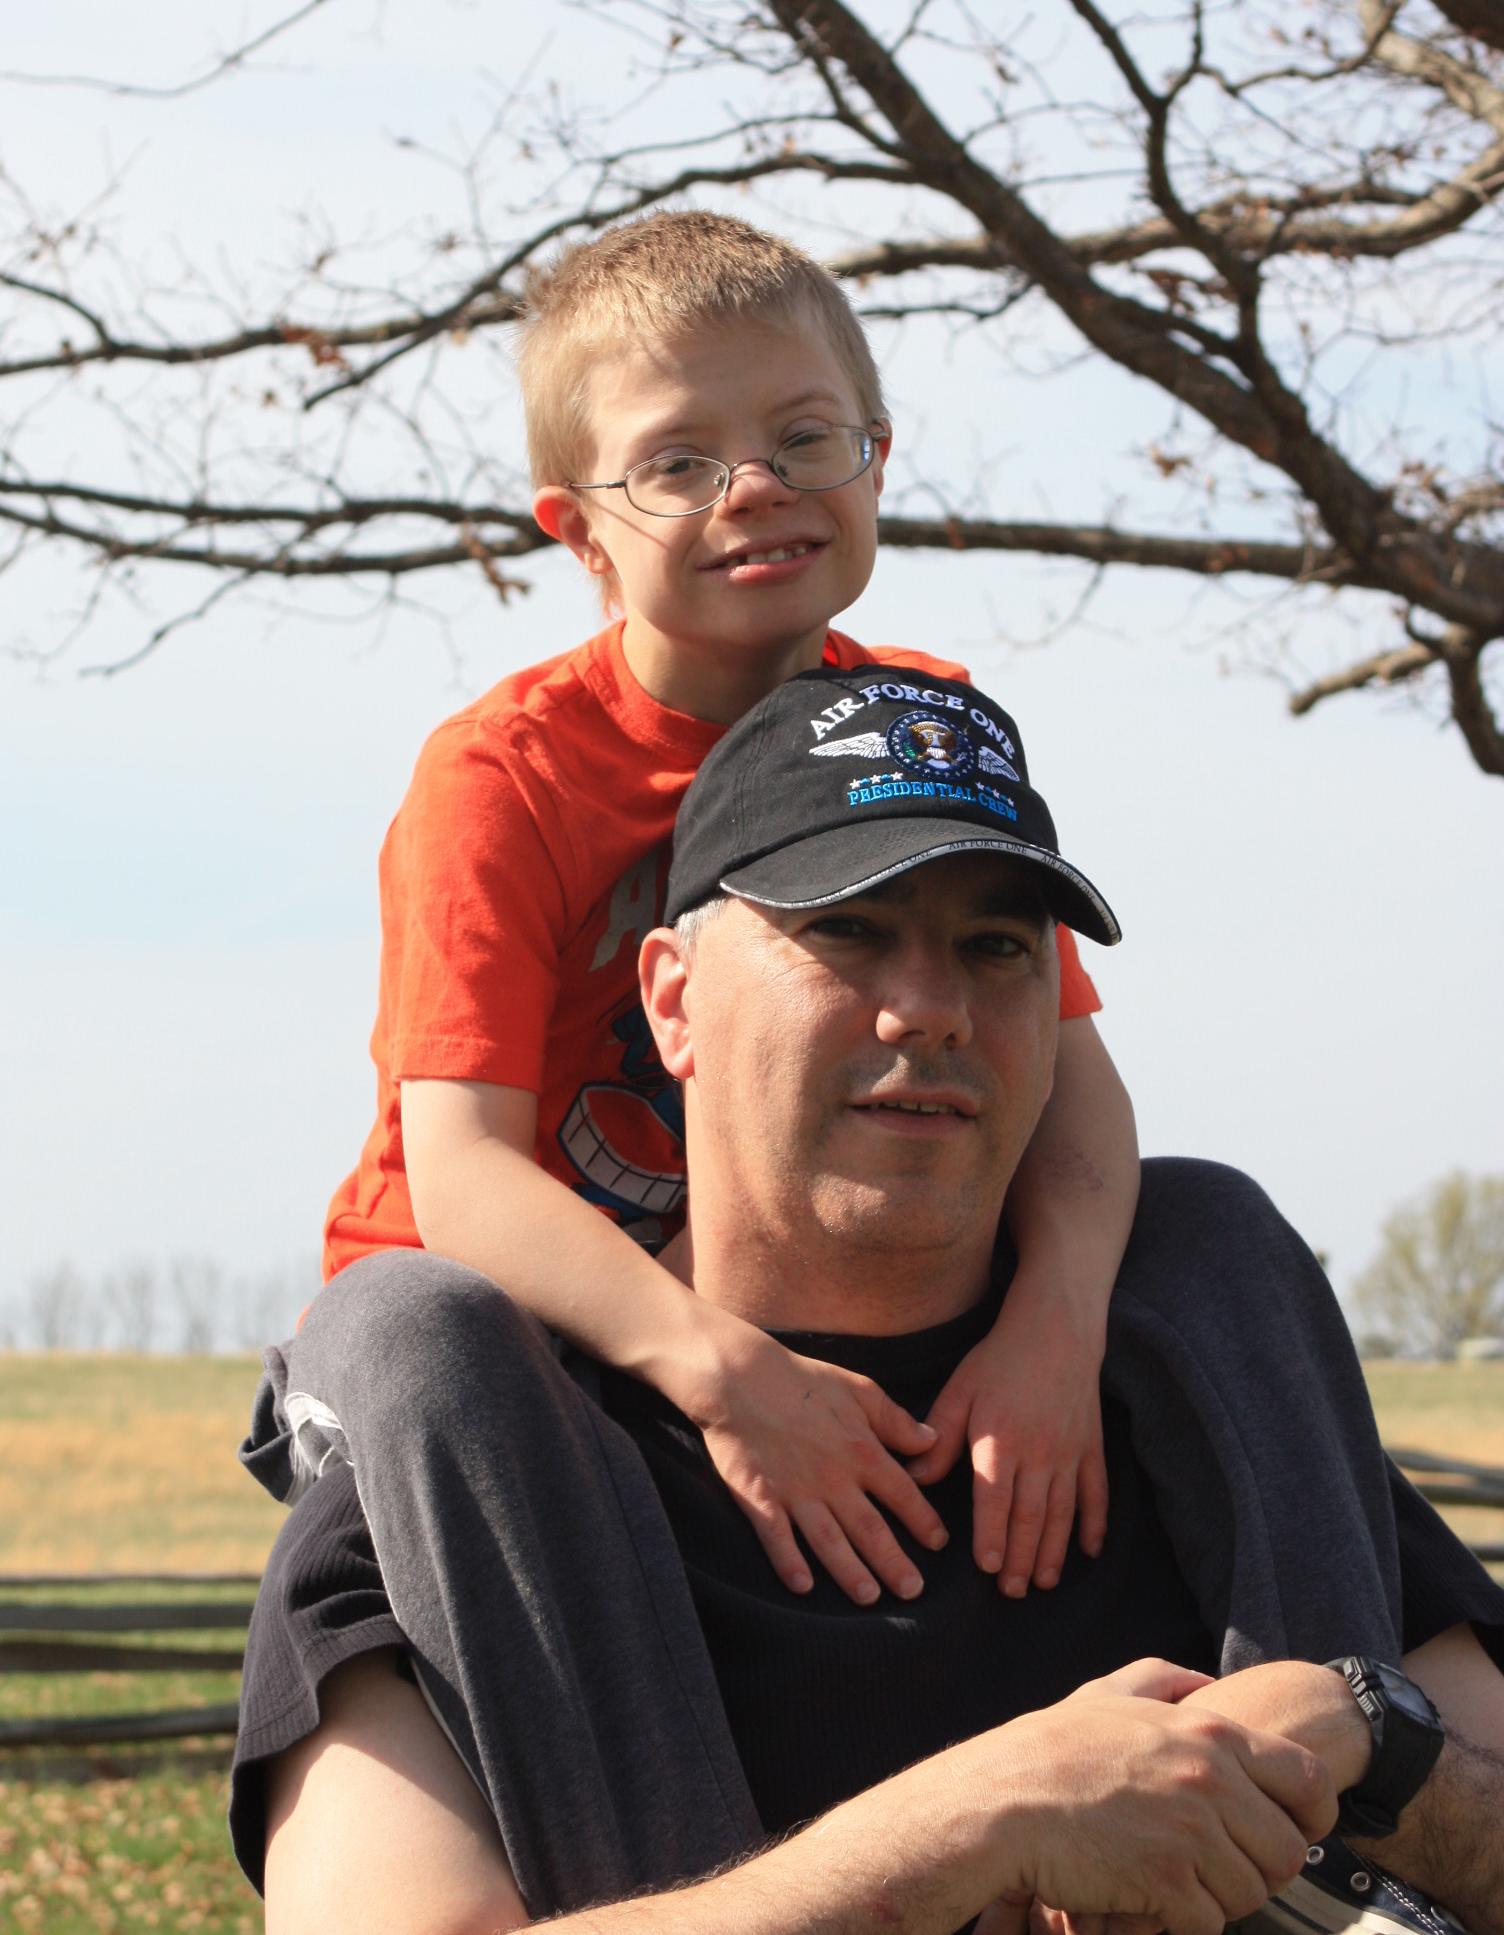 Kathryn Lariviere's son | Sheknows.com